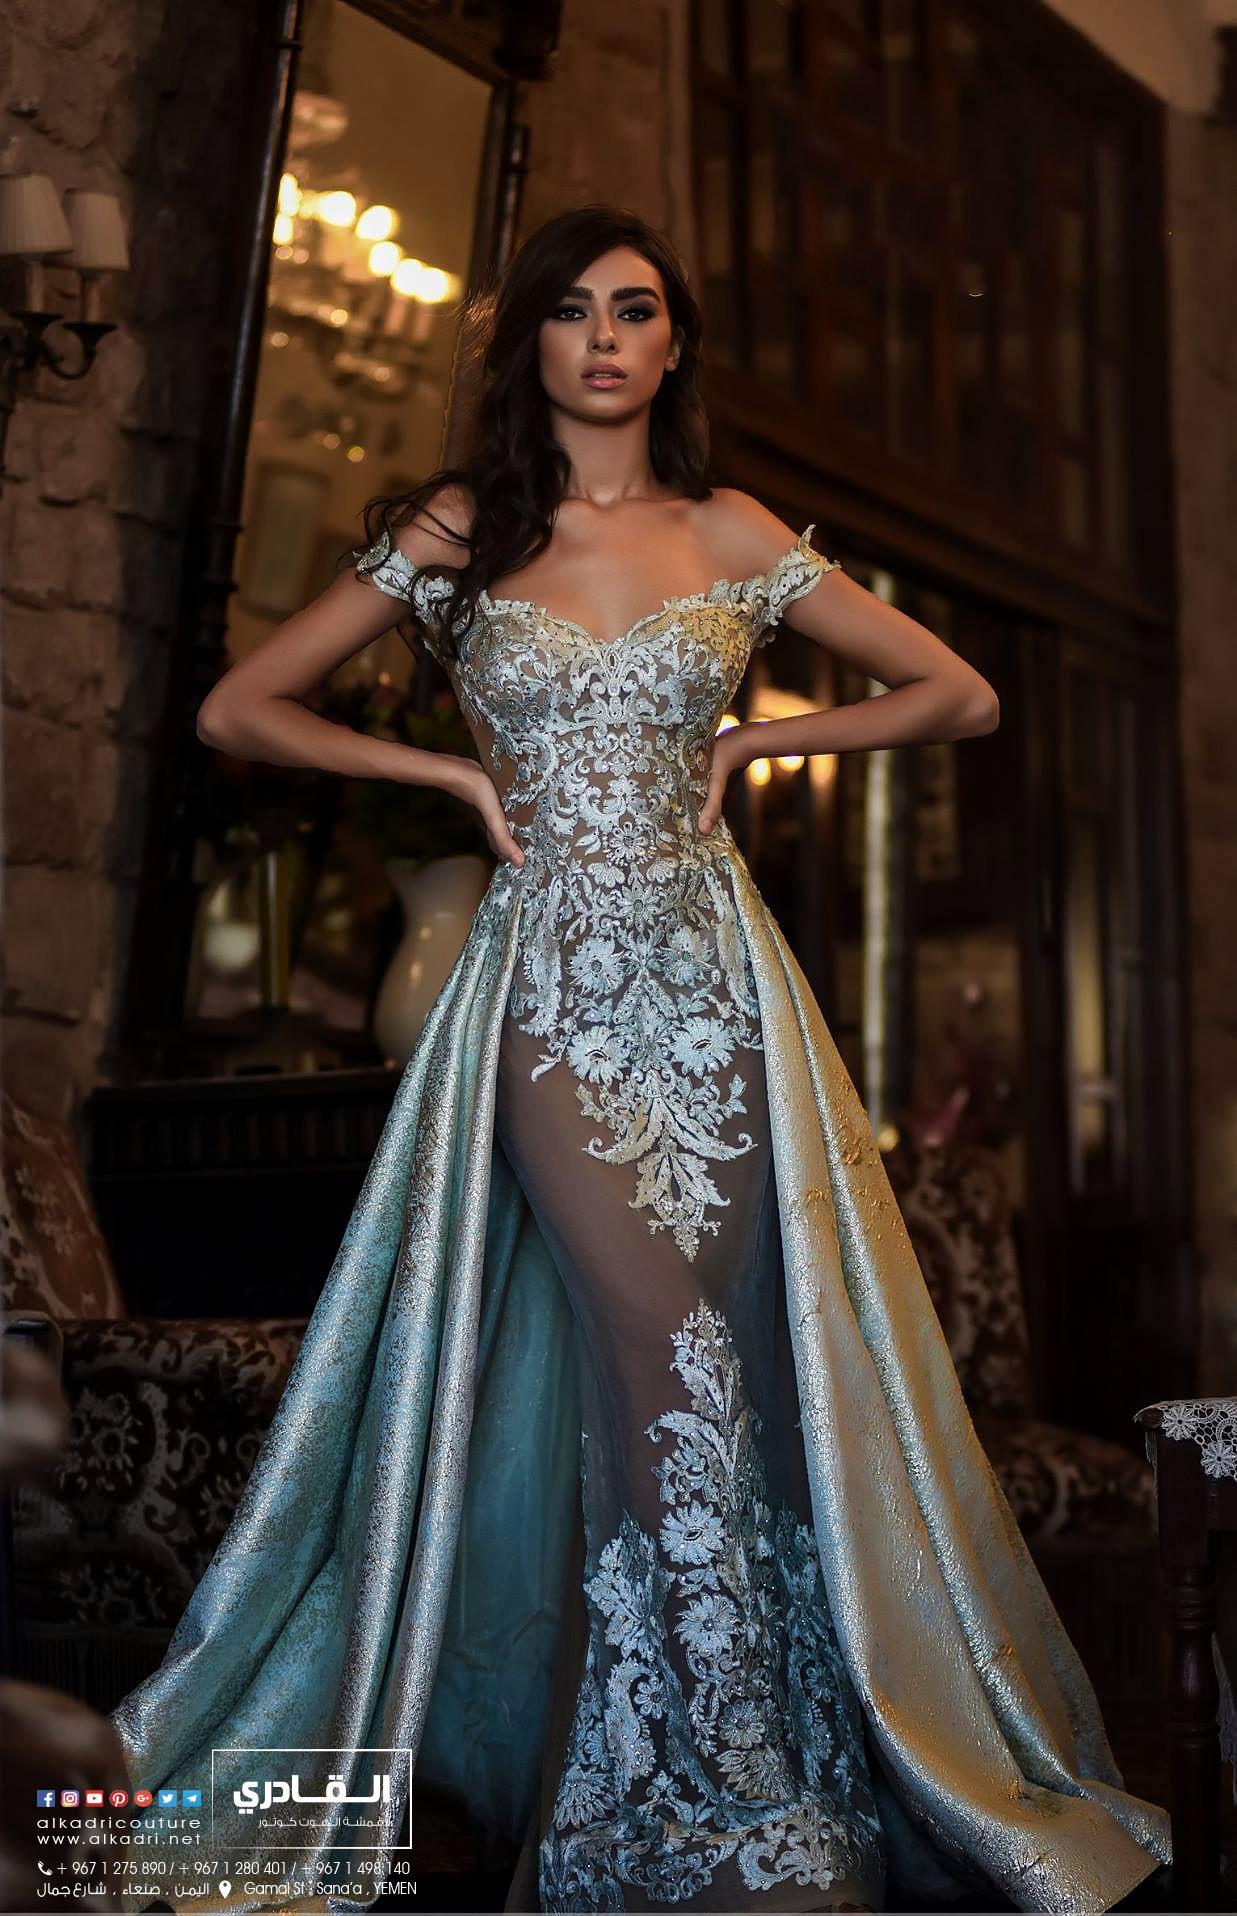 15 Kreativ Extravagante Abendkleider Stylish17 Elegant Extravagante Abendkleider Bester Preis